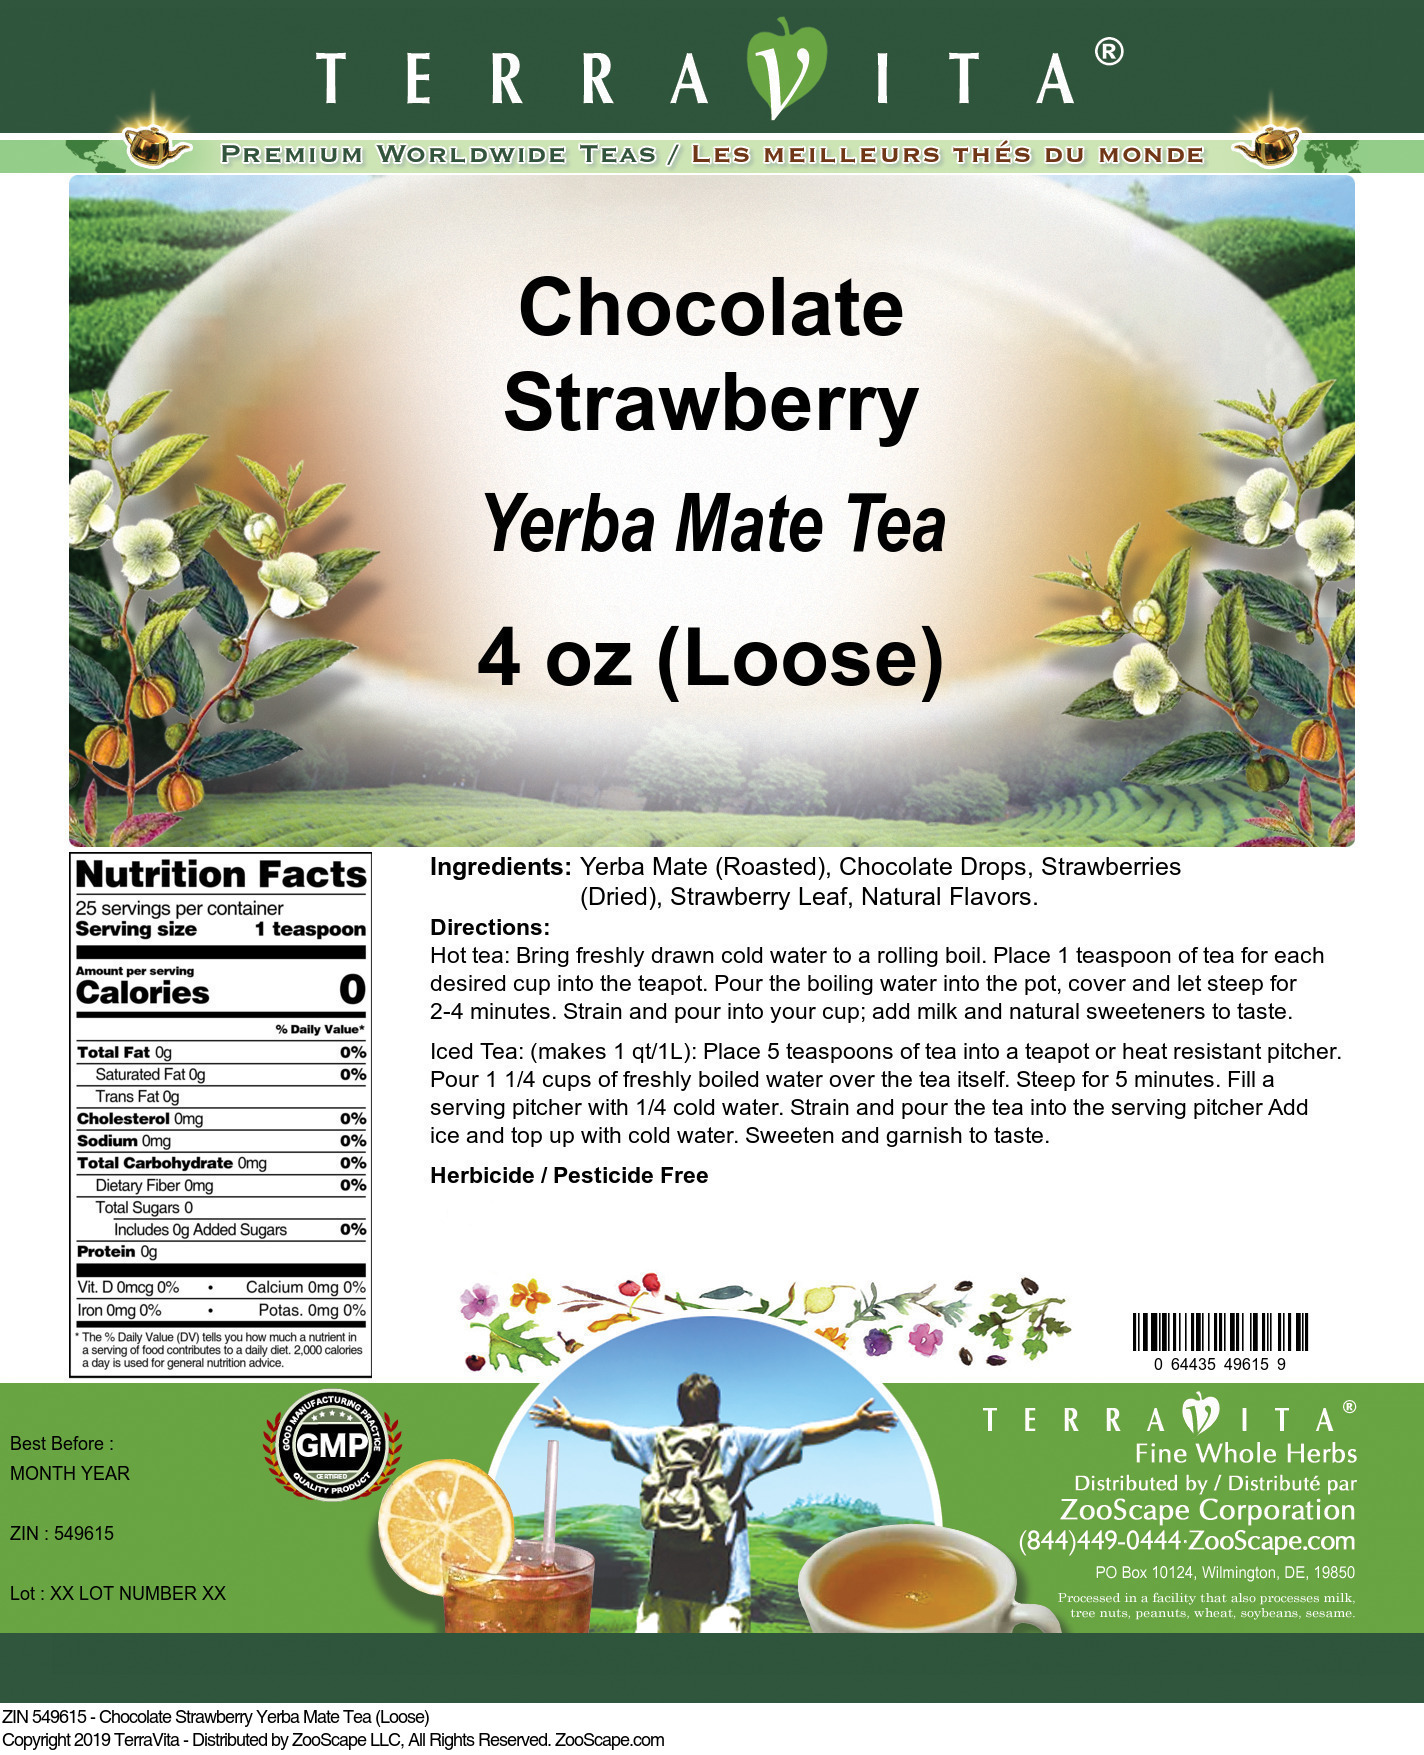 Chocolate Strawberry Yerba Mate Tea (Loose)